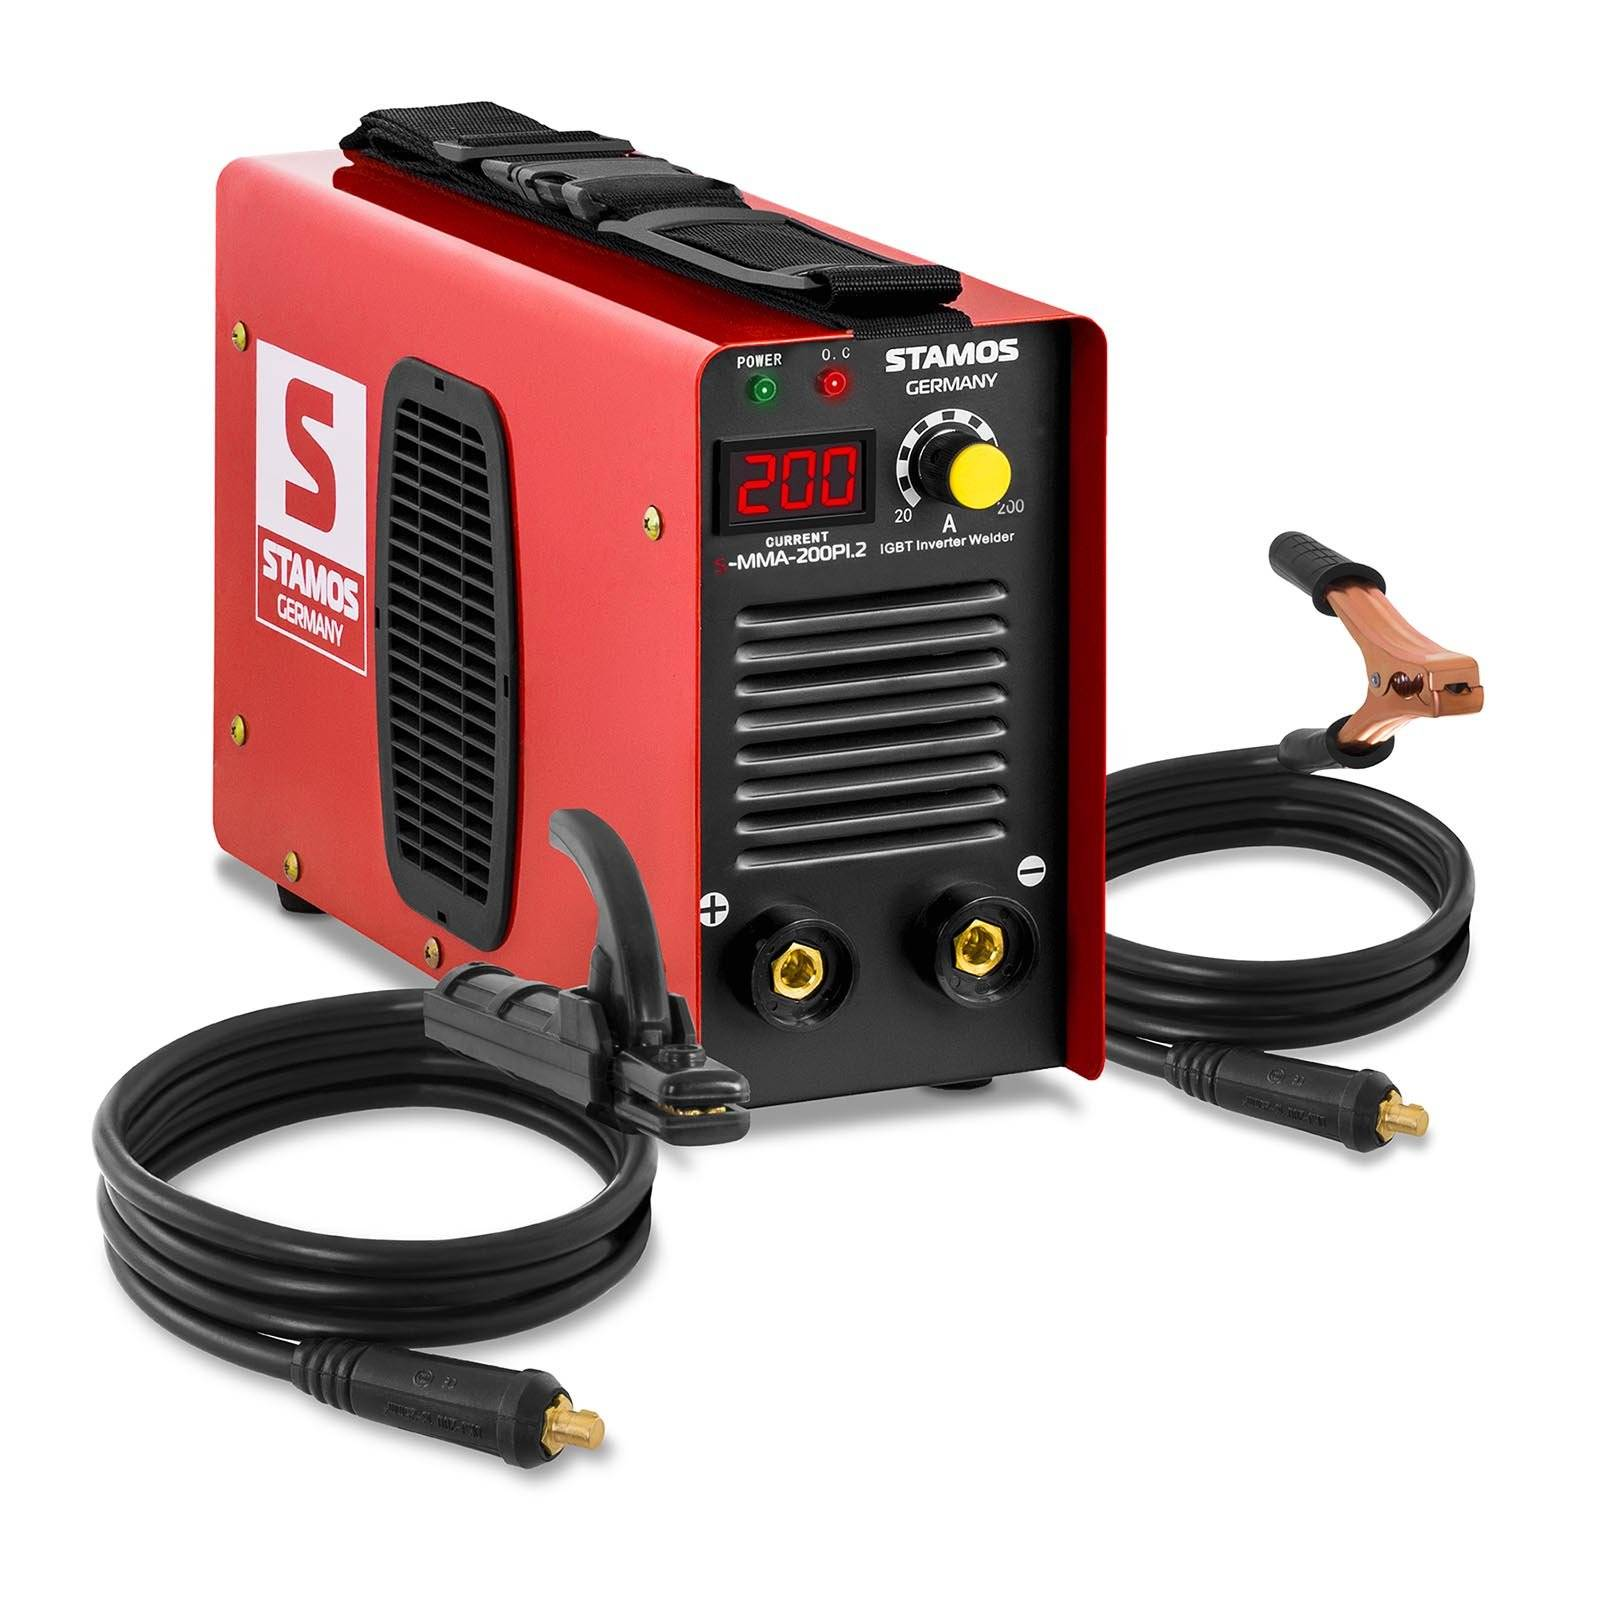 stamos germany saldatrice mma - 200 a - 230 v - hot start - igbt - display a led s-mma-200pi.2